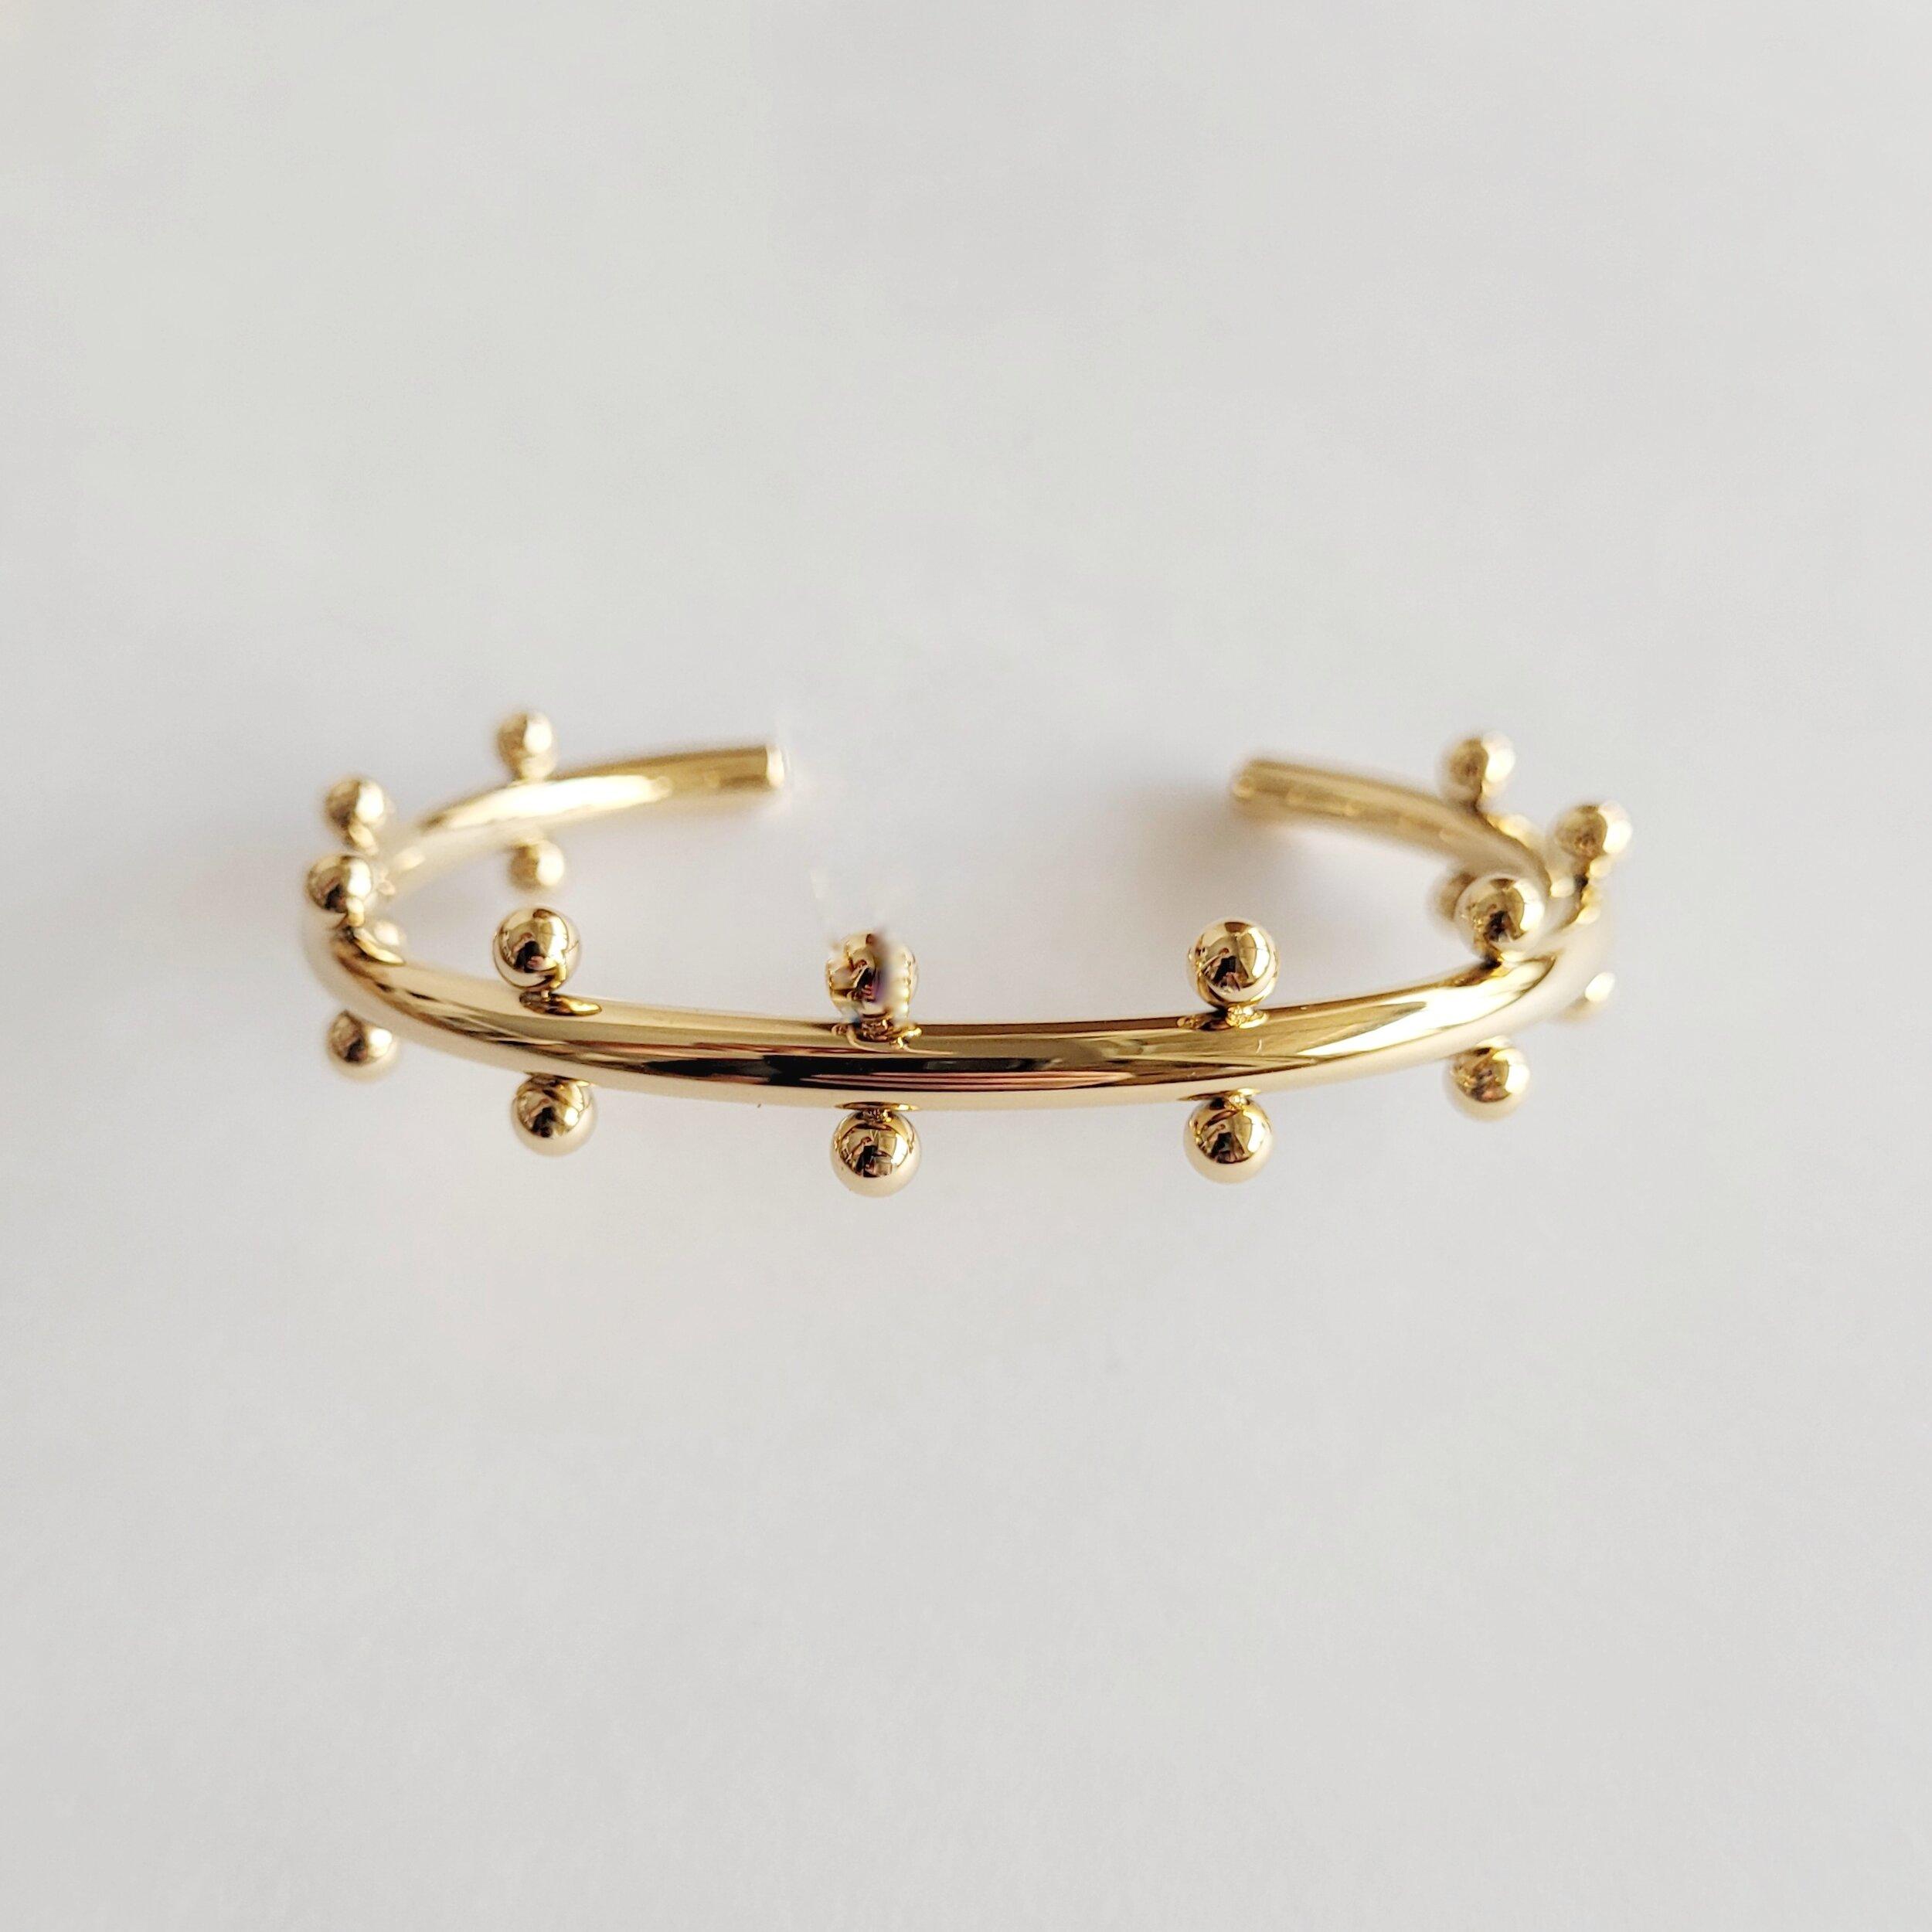 Gold plated Unity cuff bracelet